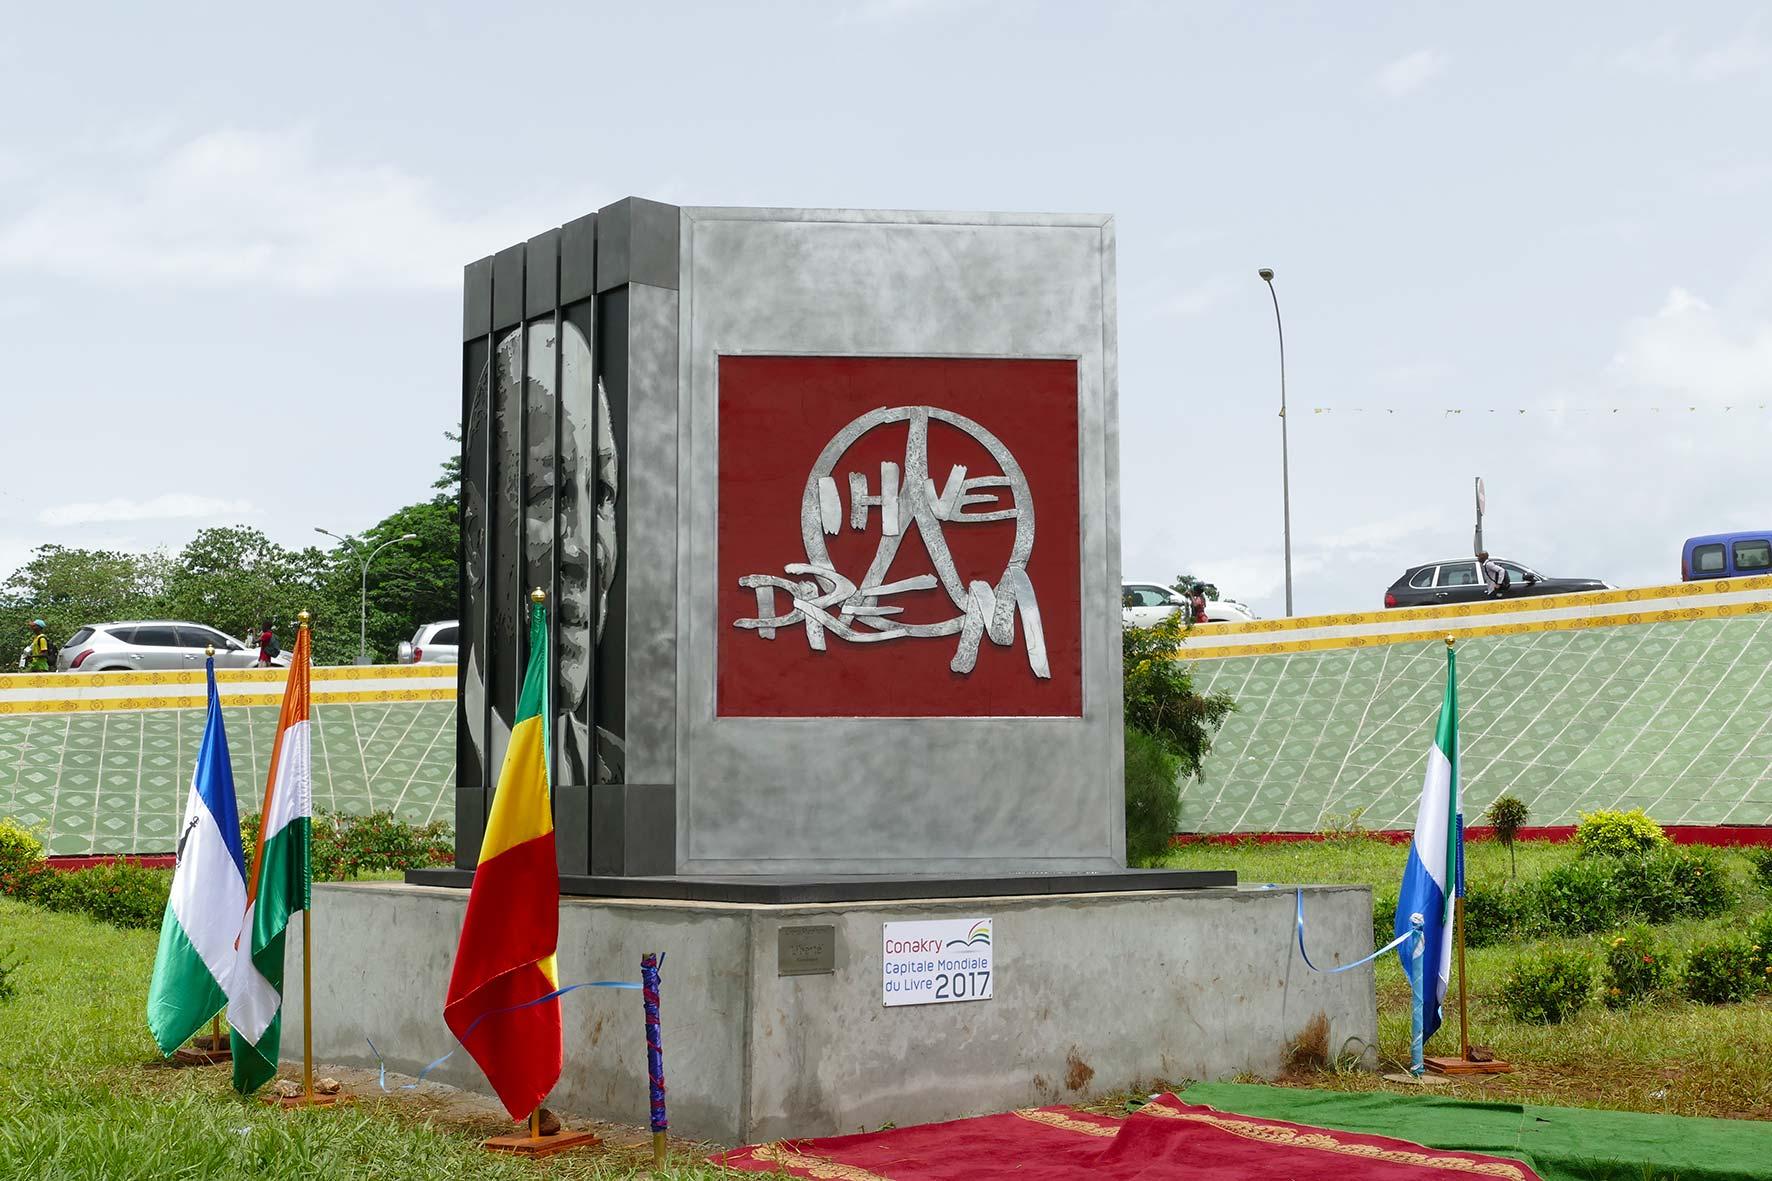 cipre_artiste_sculpteur_liberte_conakry_capitale_mondiale_du_livre_2017_inauguration.jpg